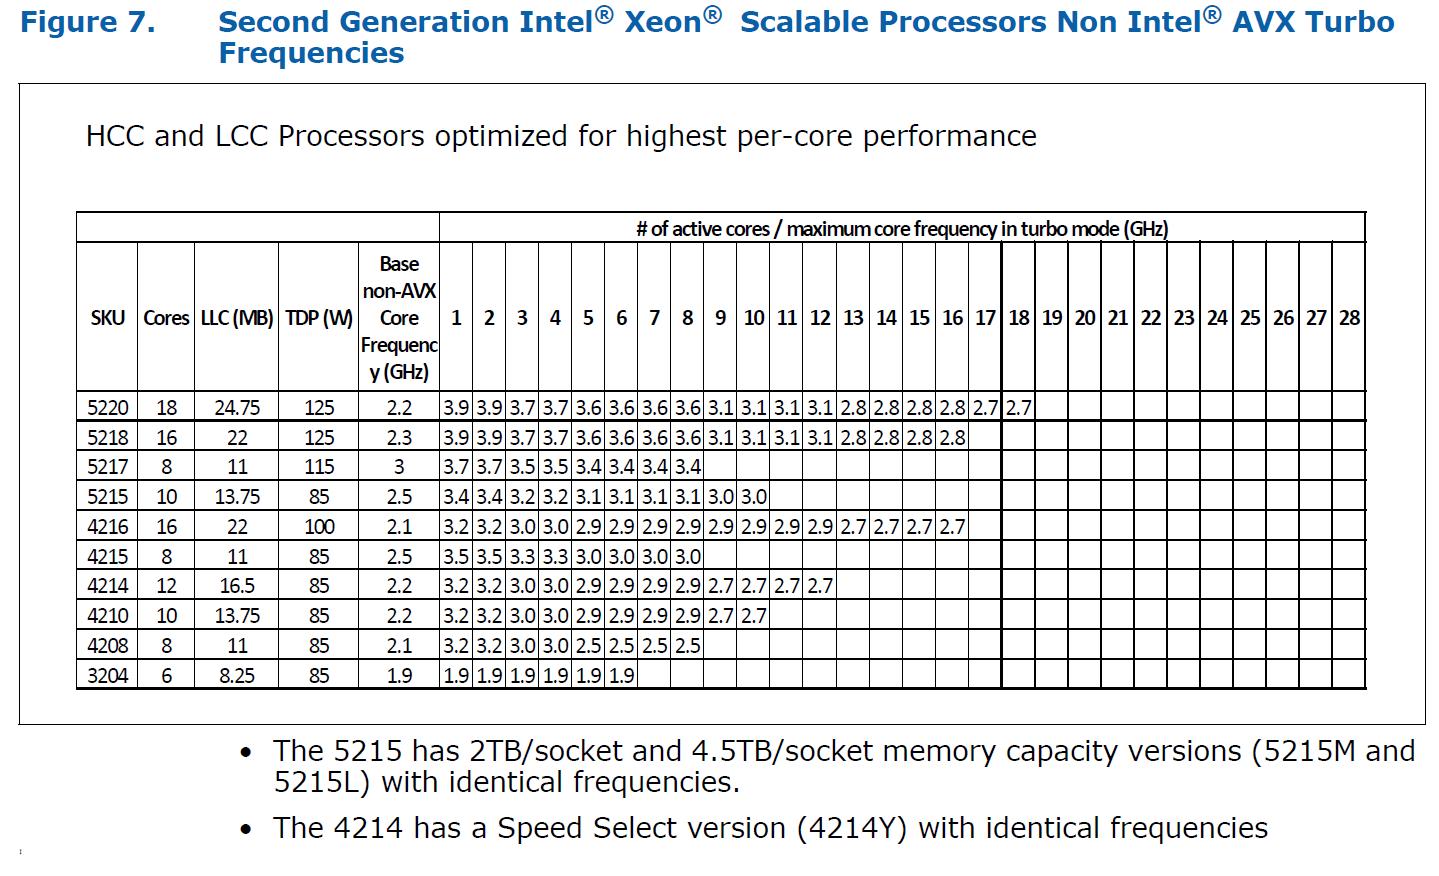 Cascade Lake-SP Turbo ohne AVX (HCC und LCC)